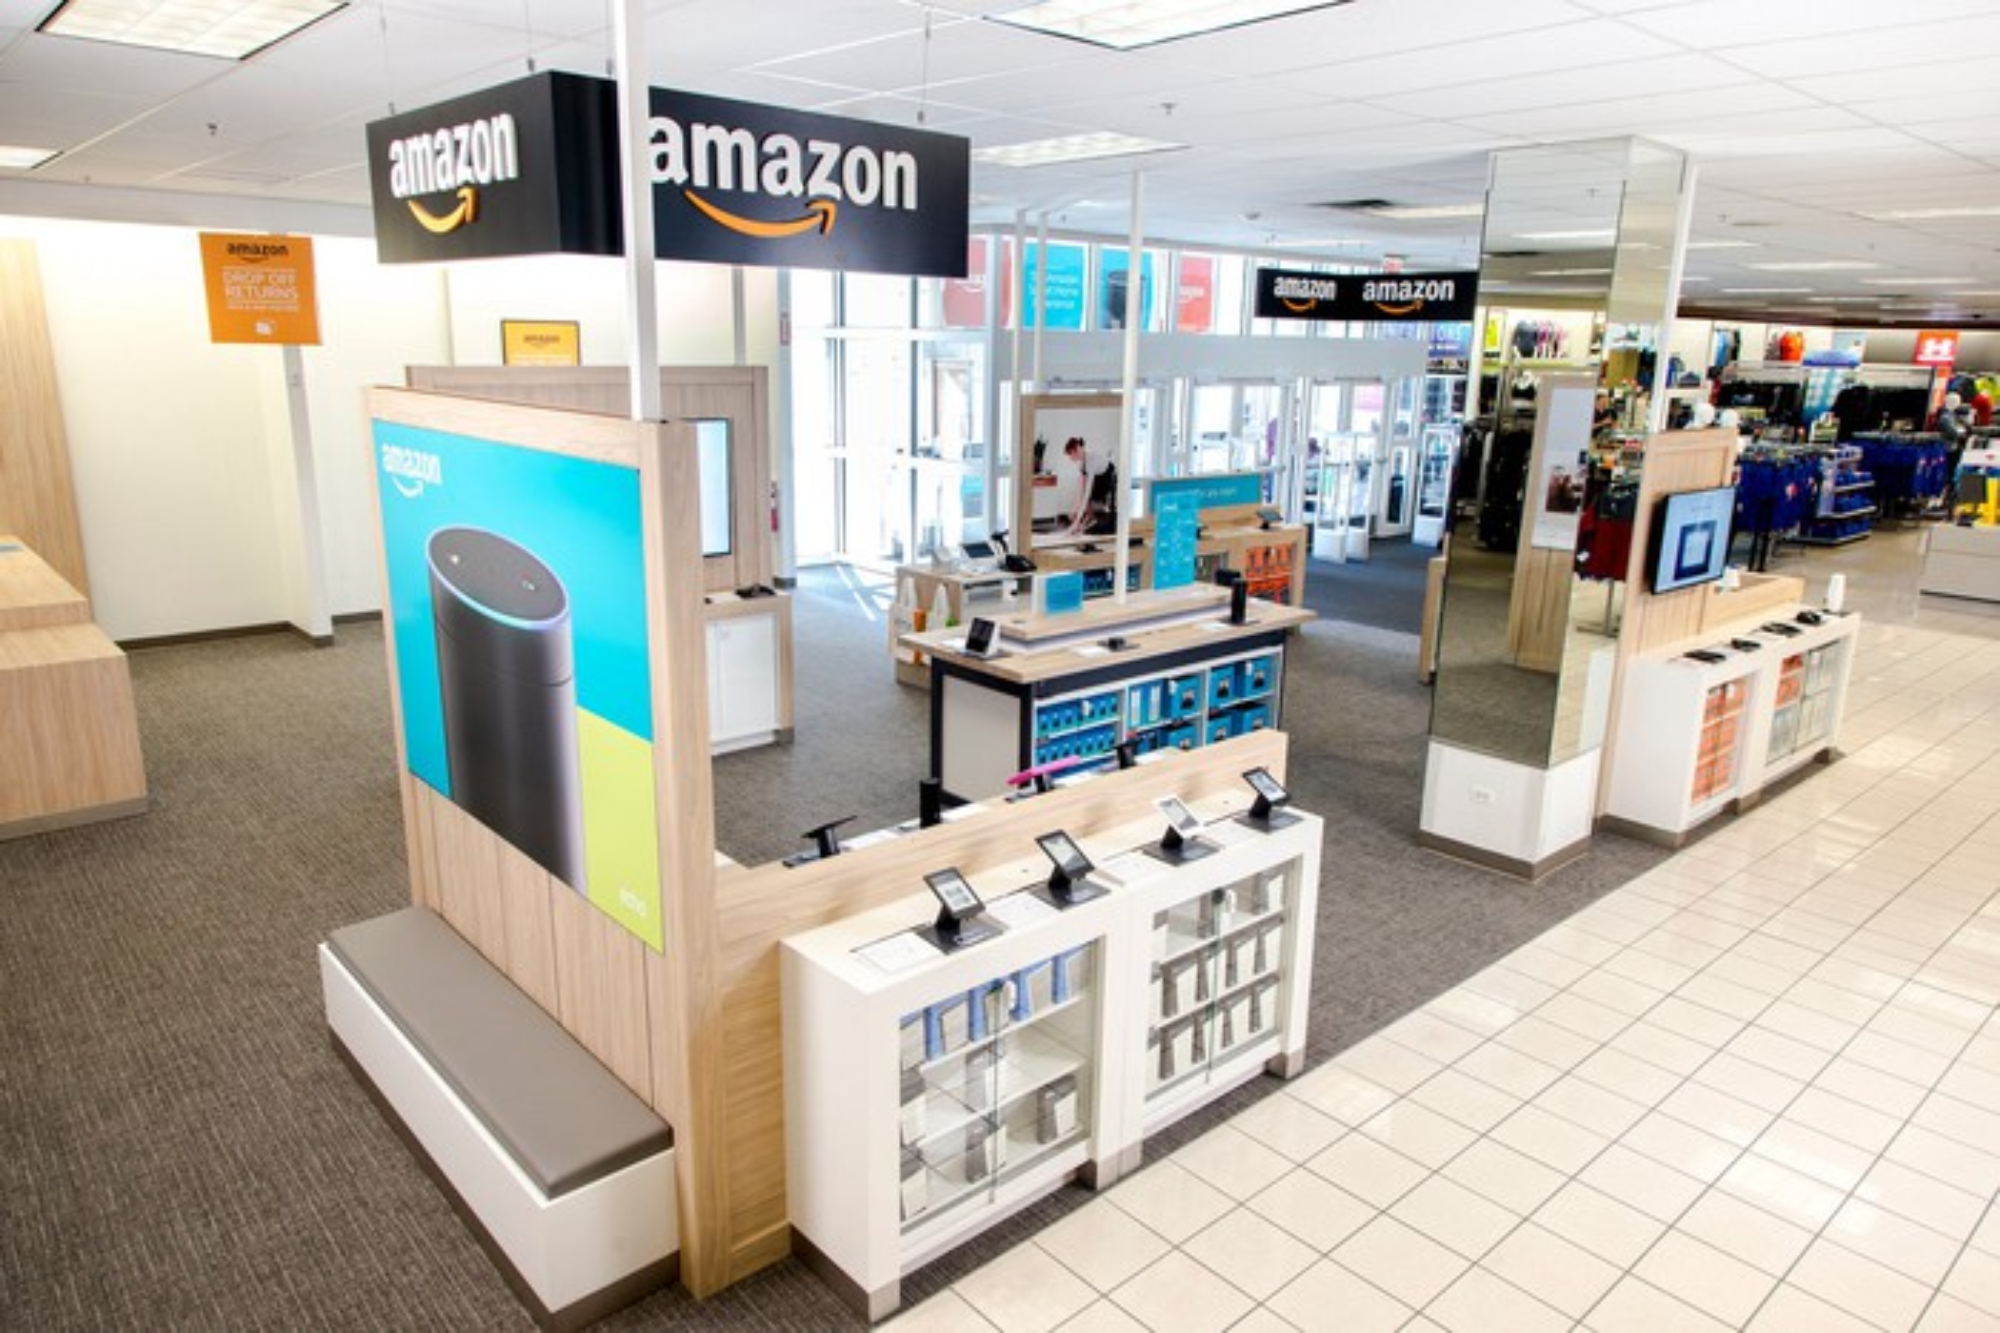 An Amazon store witnin a Kohl's.